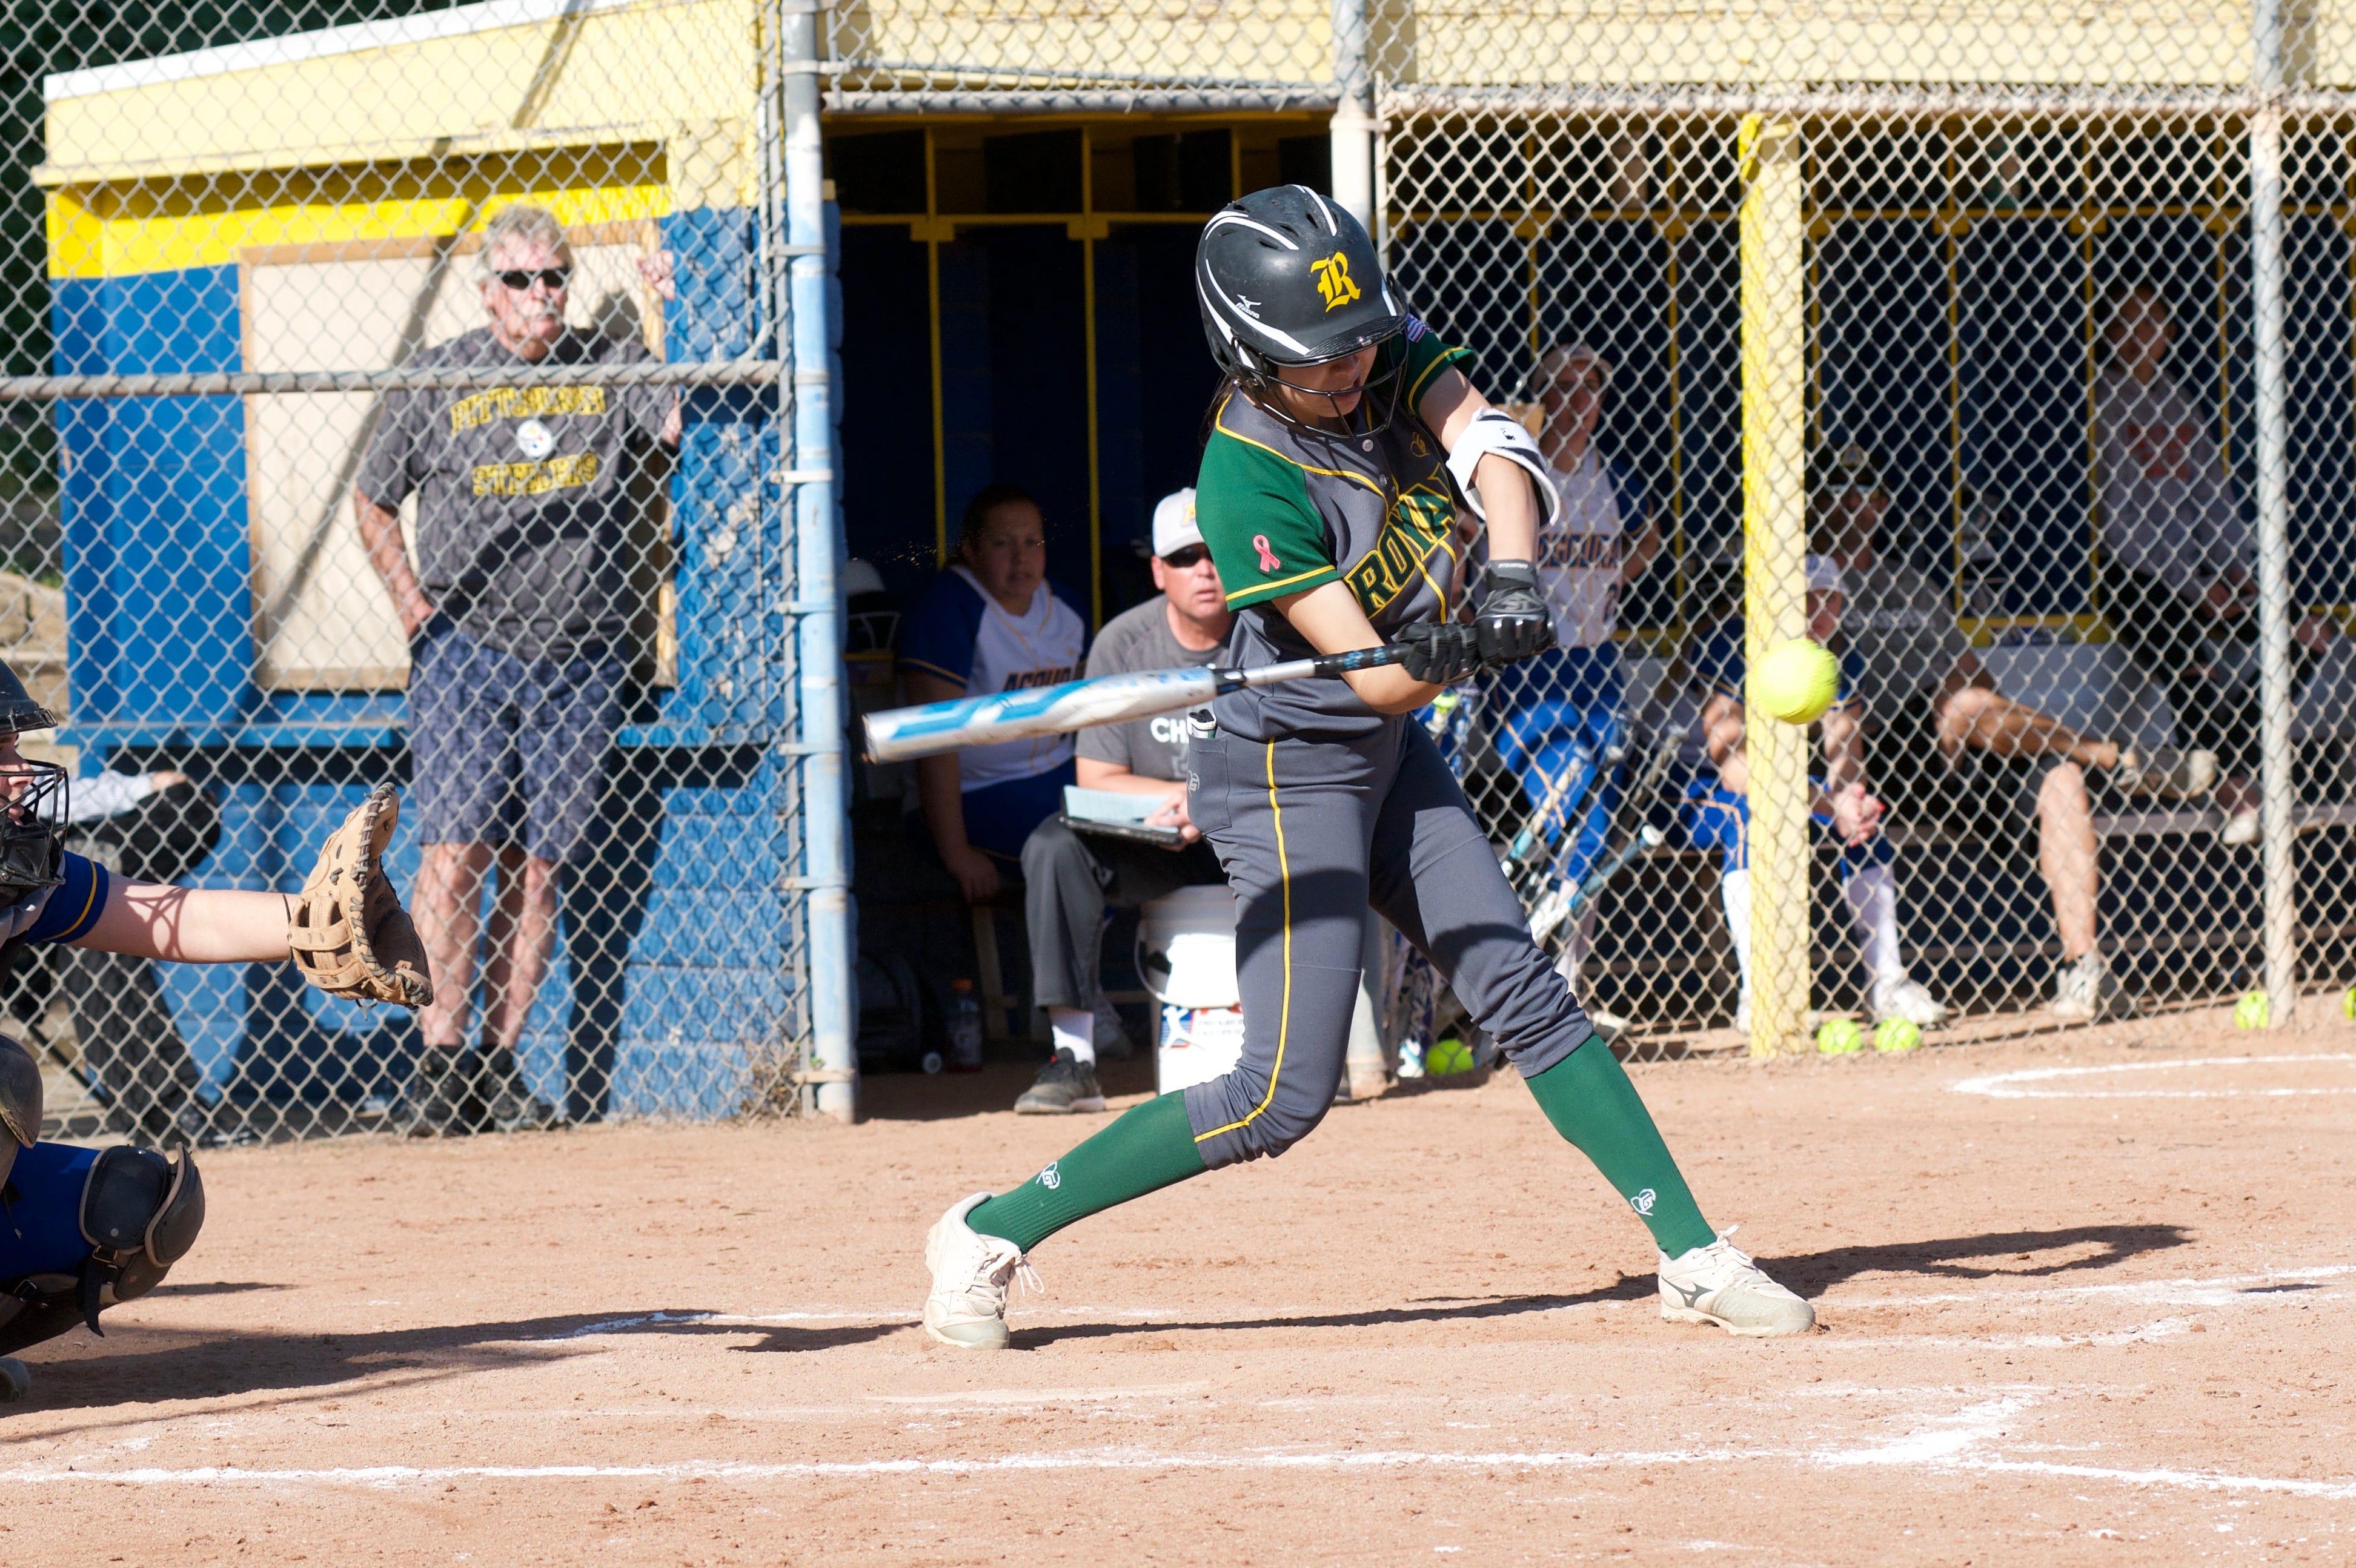 Sophomore Allison Ha leads the Royal High softball team with seven home runs.